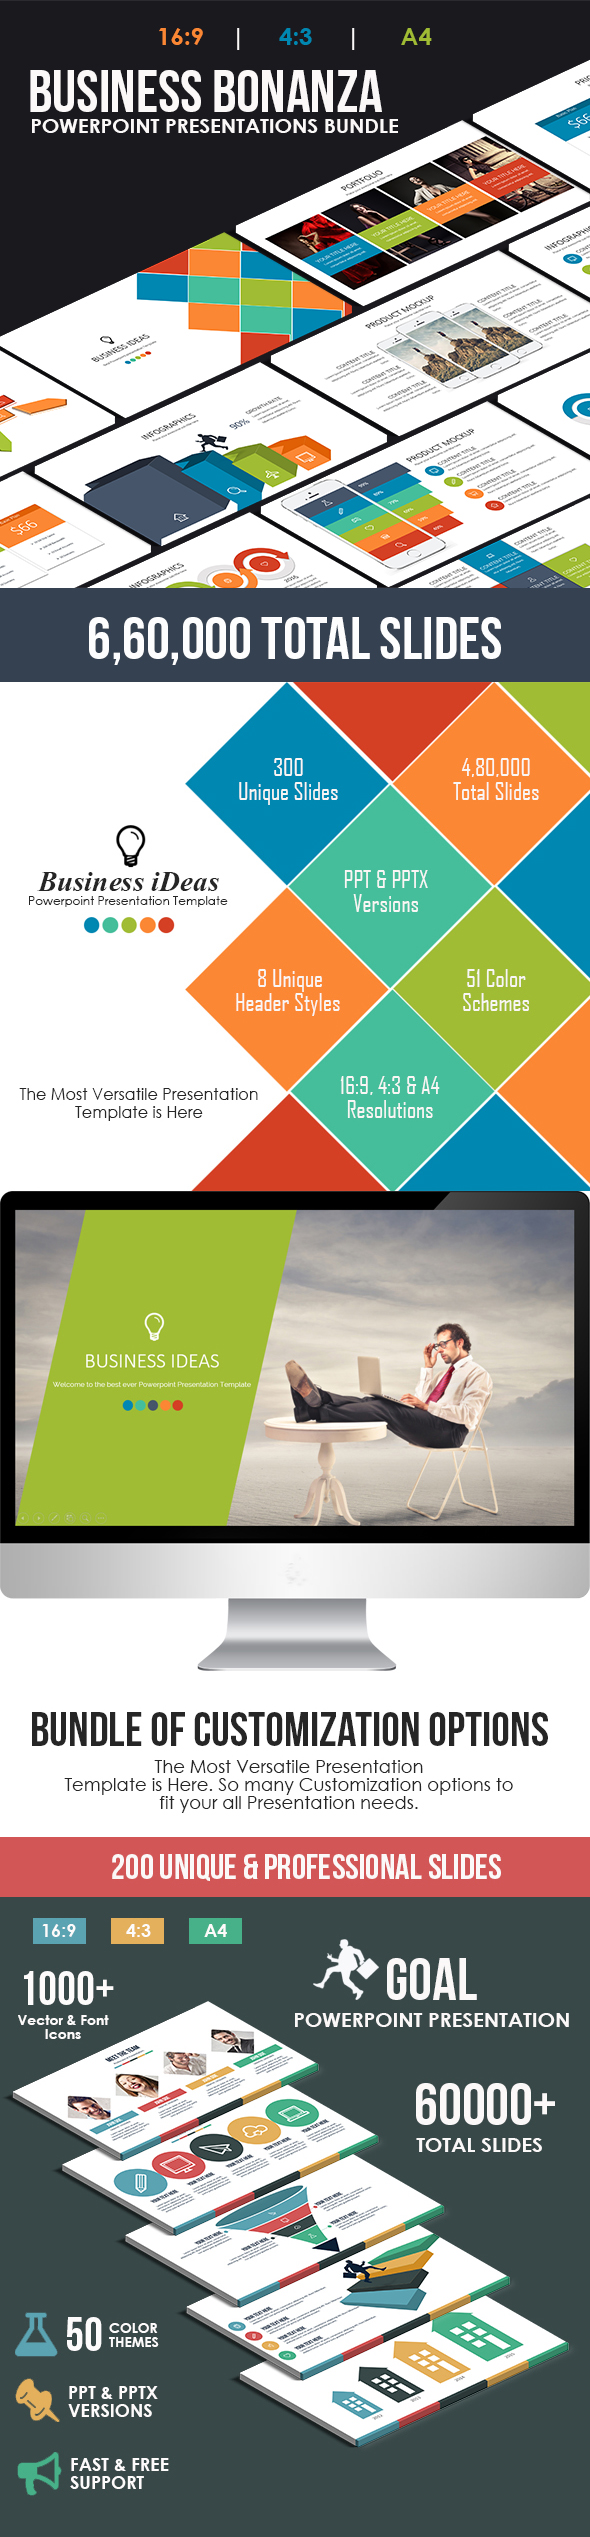 Business Bonanza Powerpoint Bundle - Business PowerPoint Templates